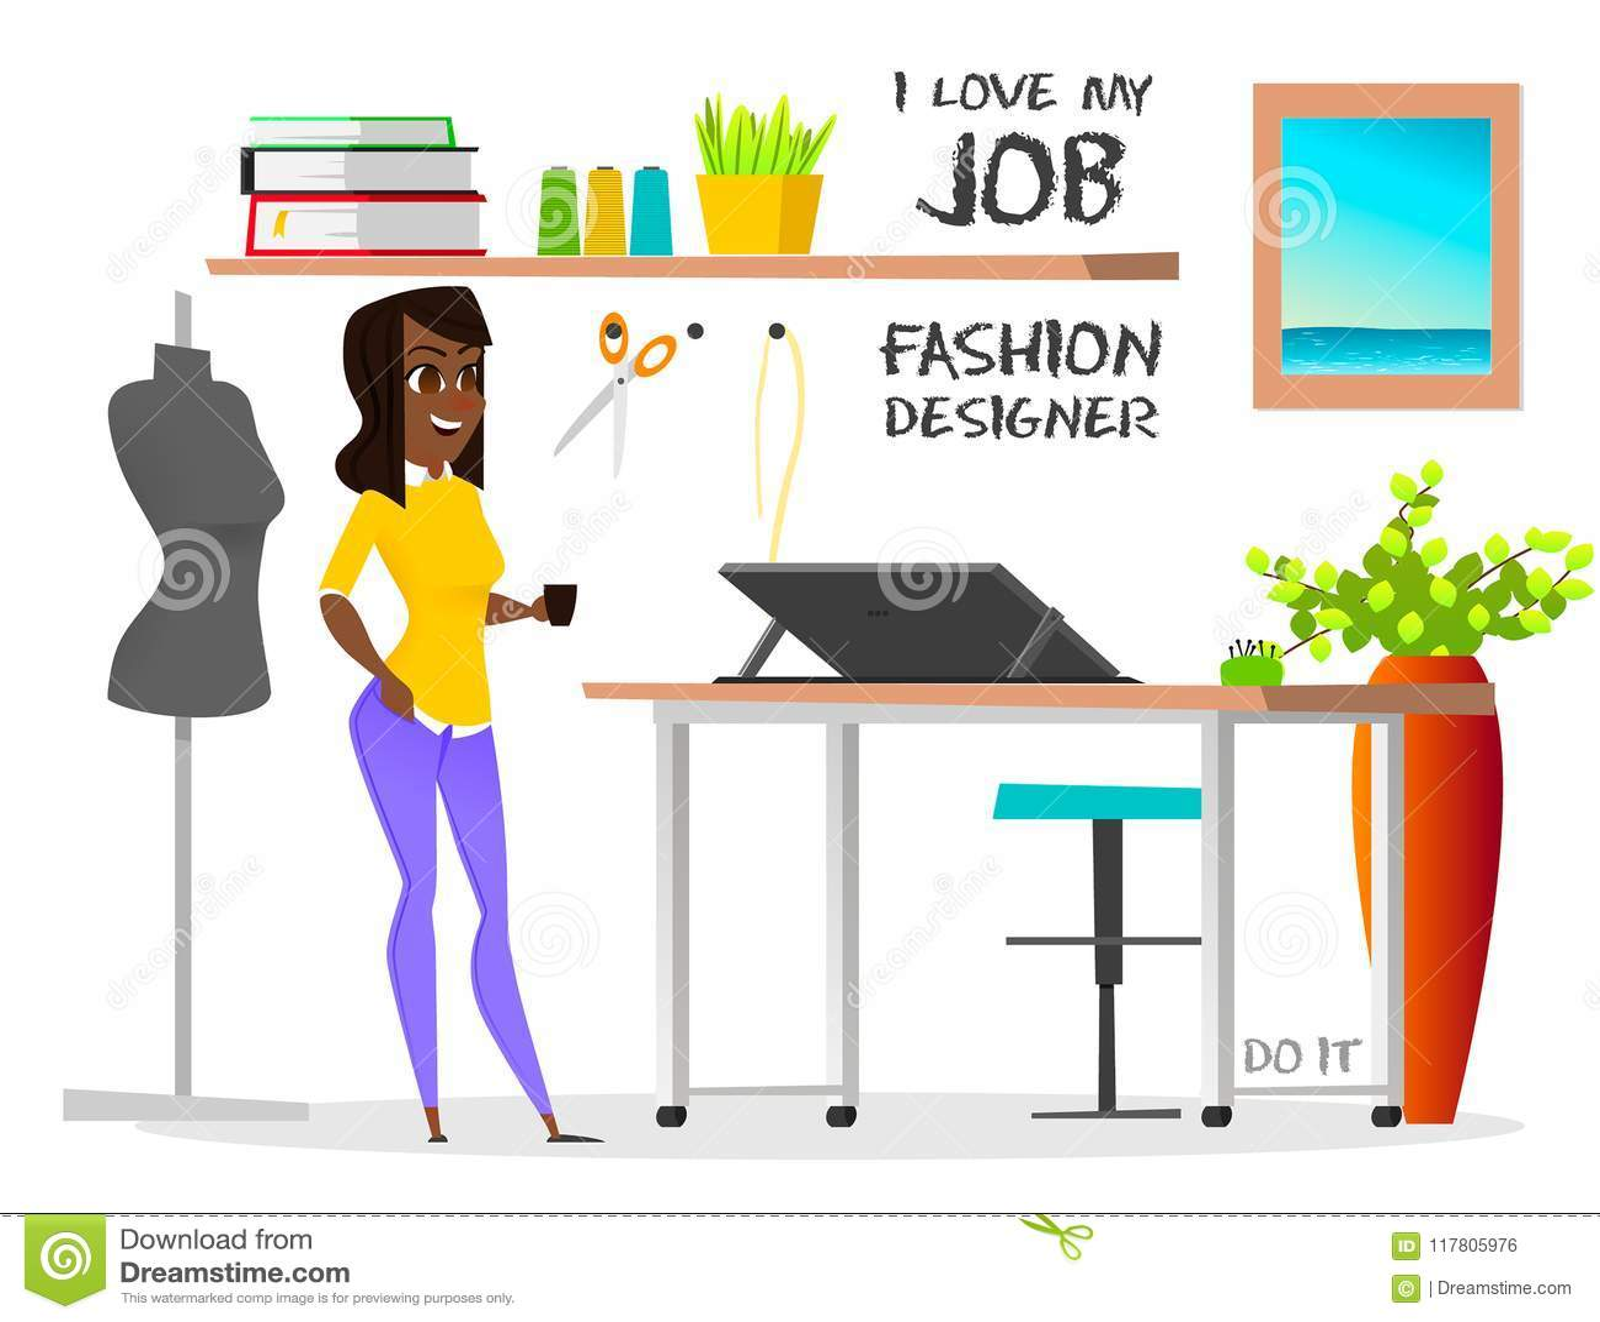 Dream Job Fashion Designer Do It Stock Vector Illustration Of Fashionable Income 117805976